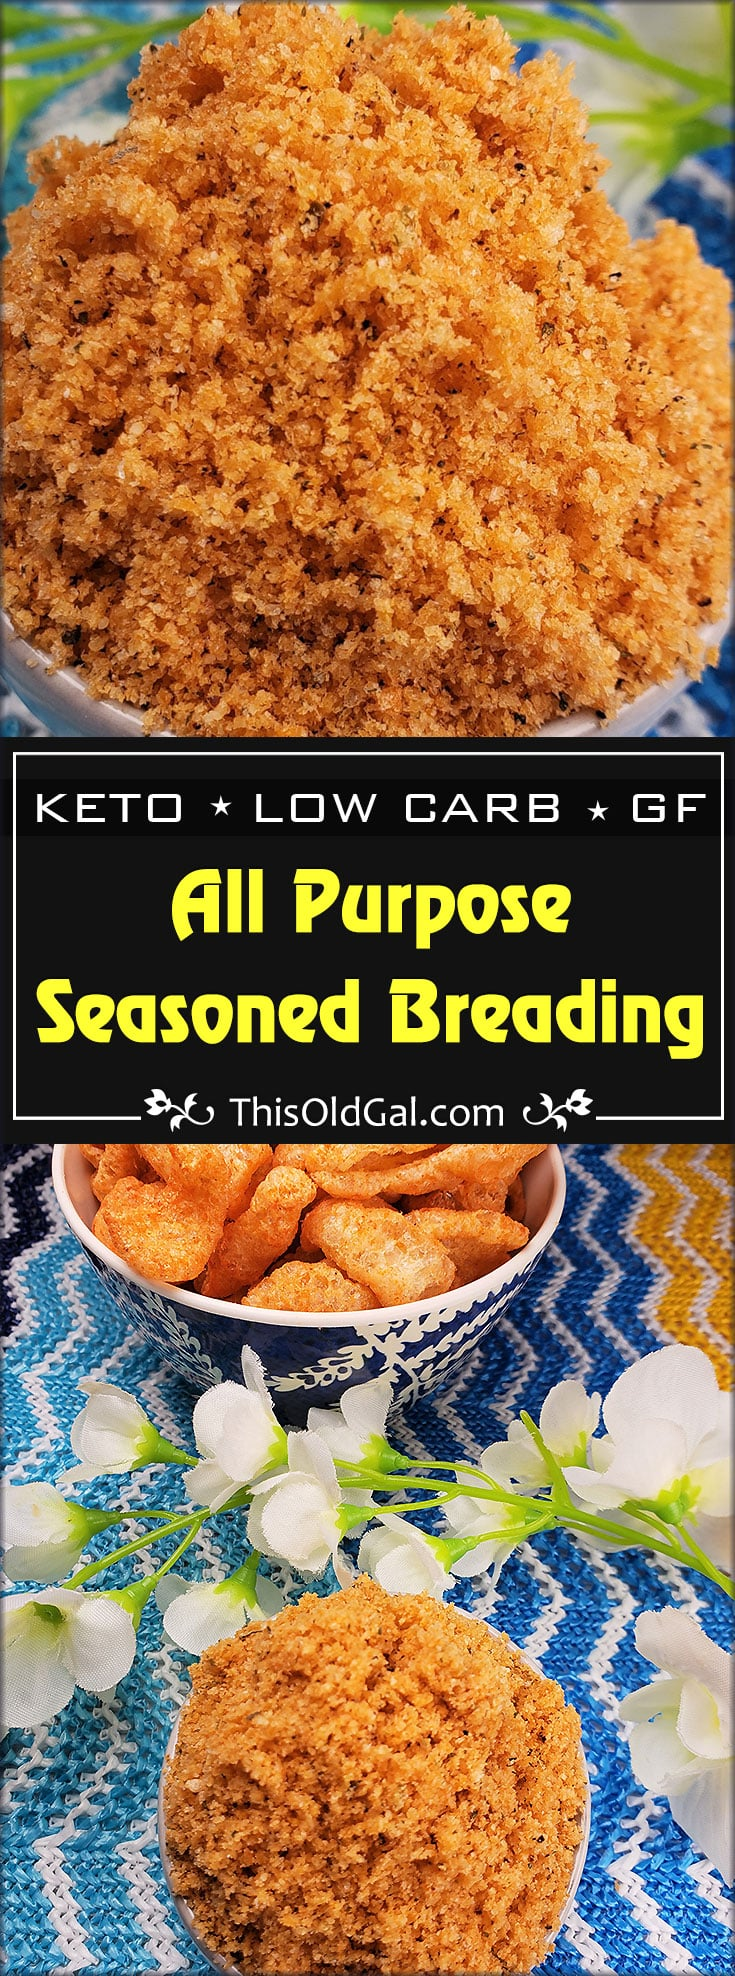 Keto All Purpose Low Carb Seasoned Breading